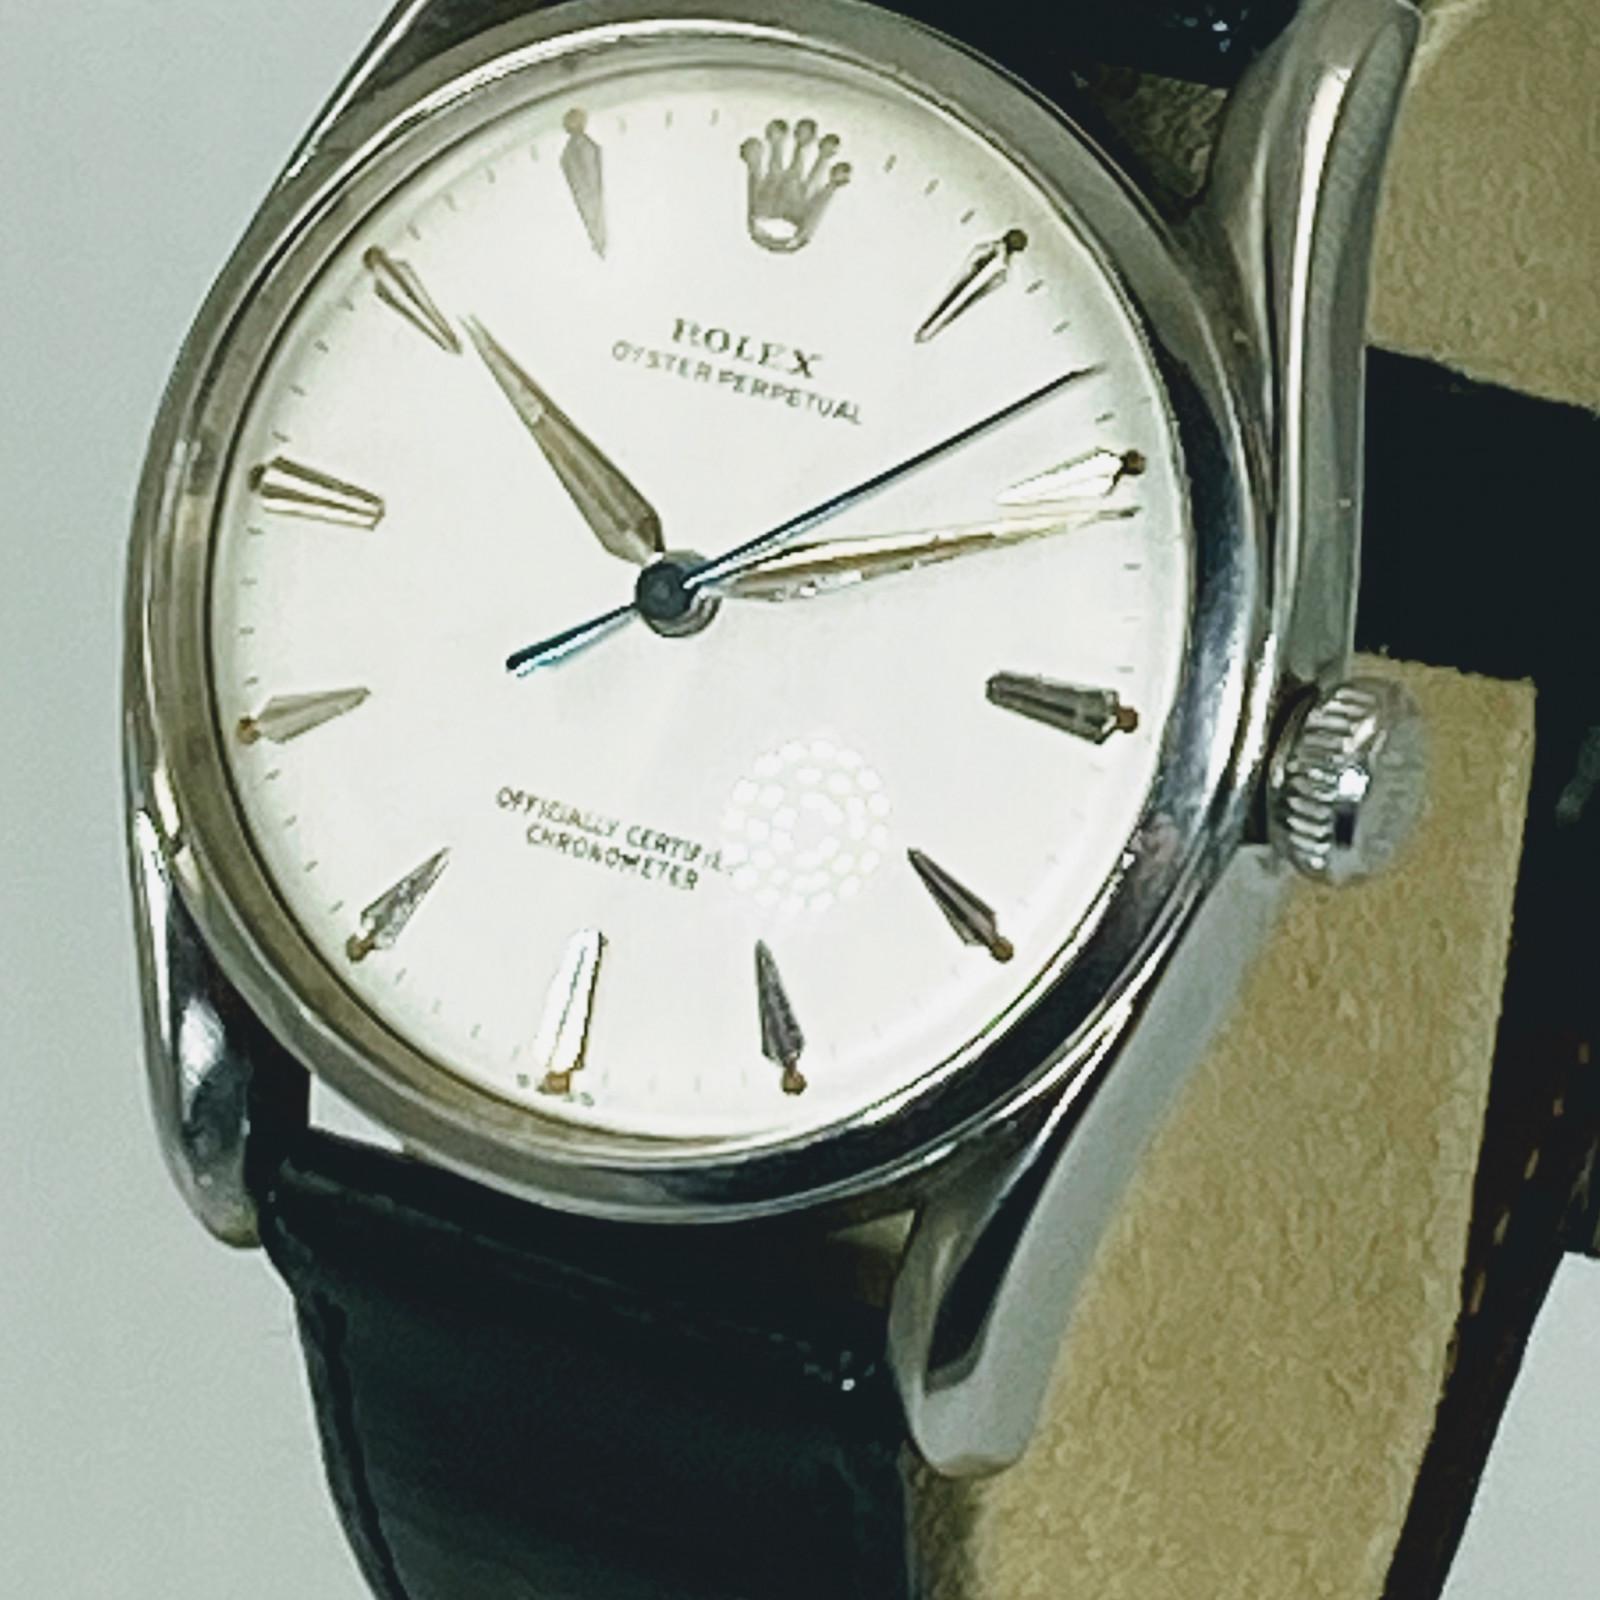 ROLEX MODEL 5018